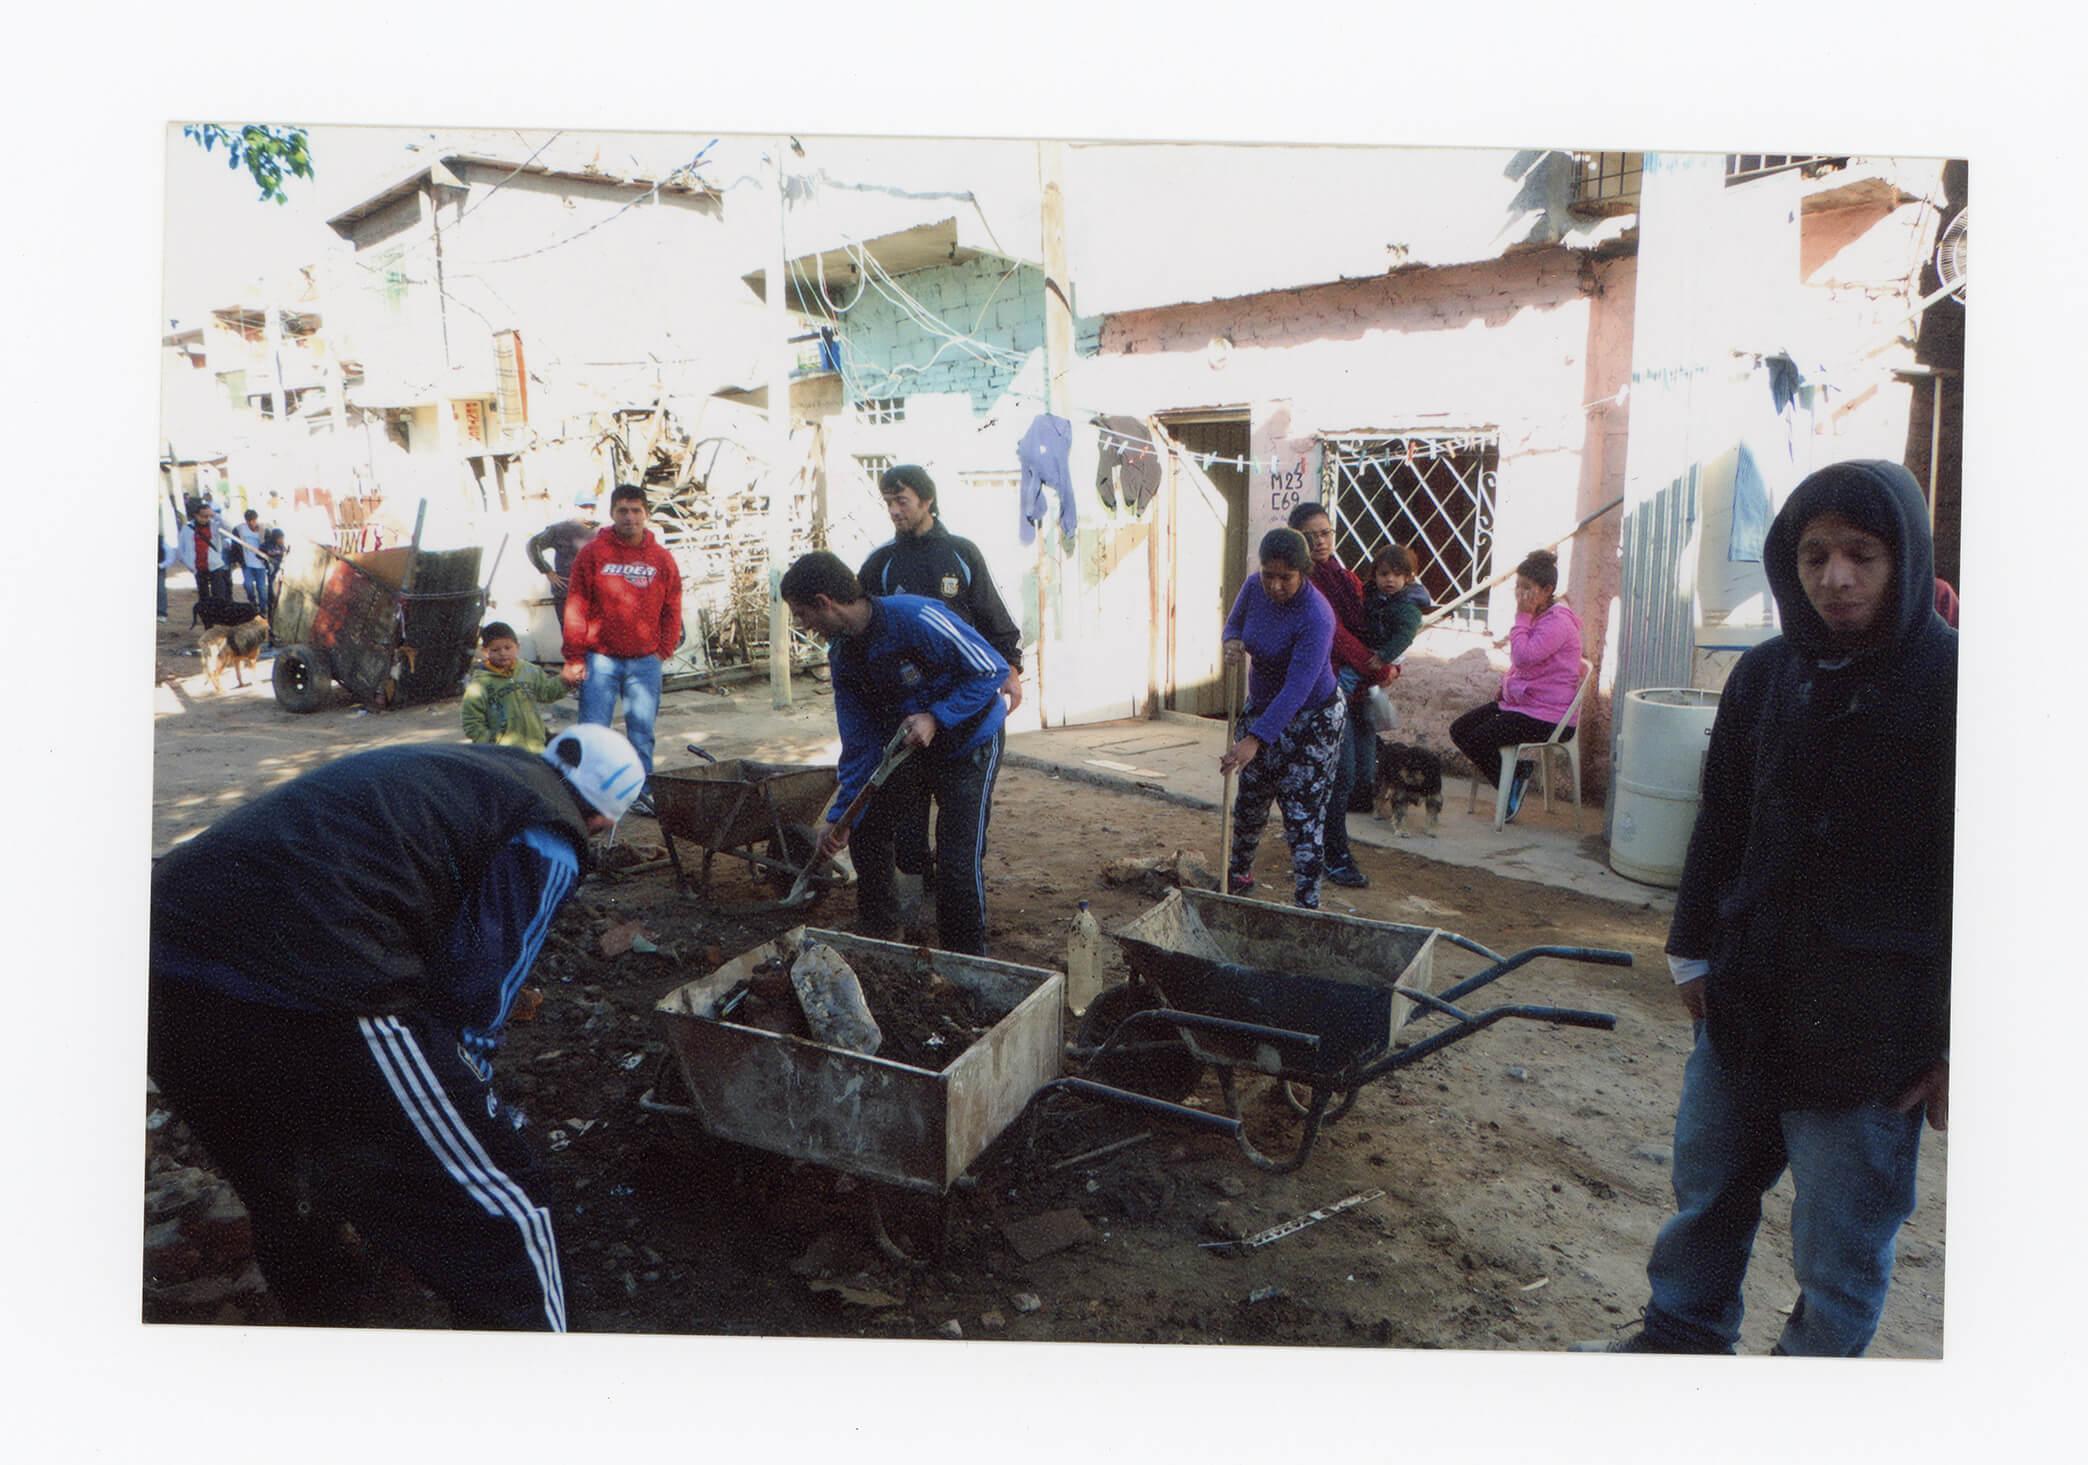 Jornada solidaria entre vecinxs de la manzana 22